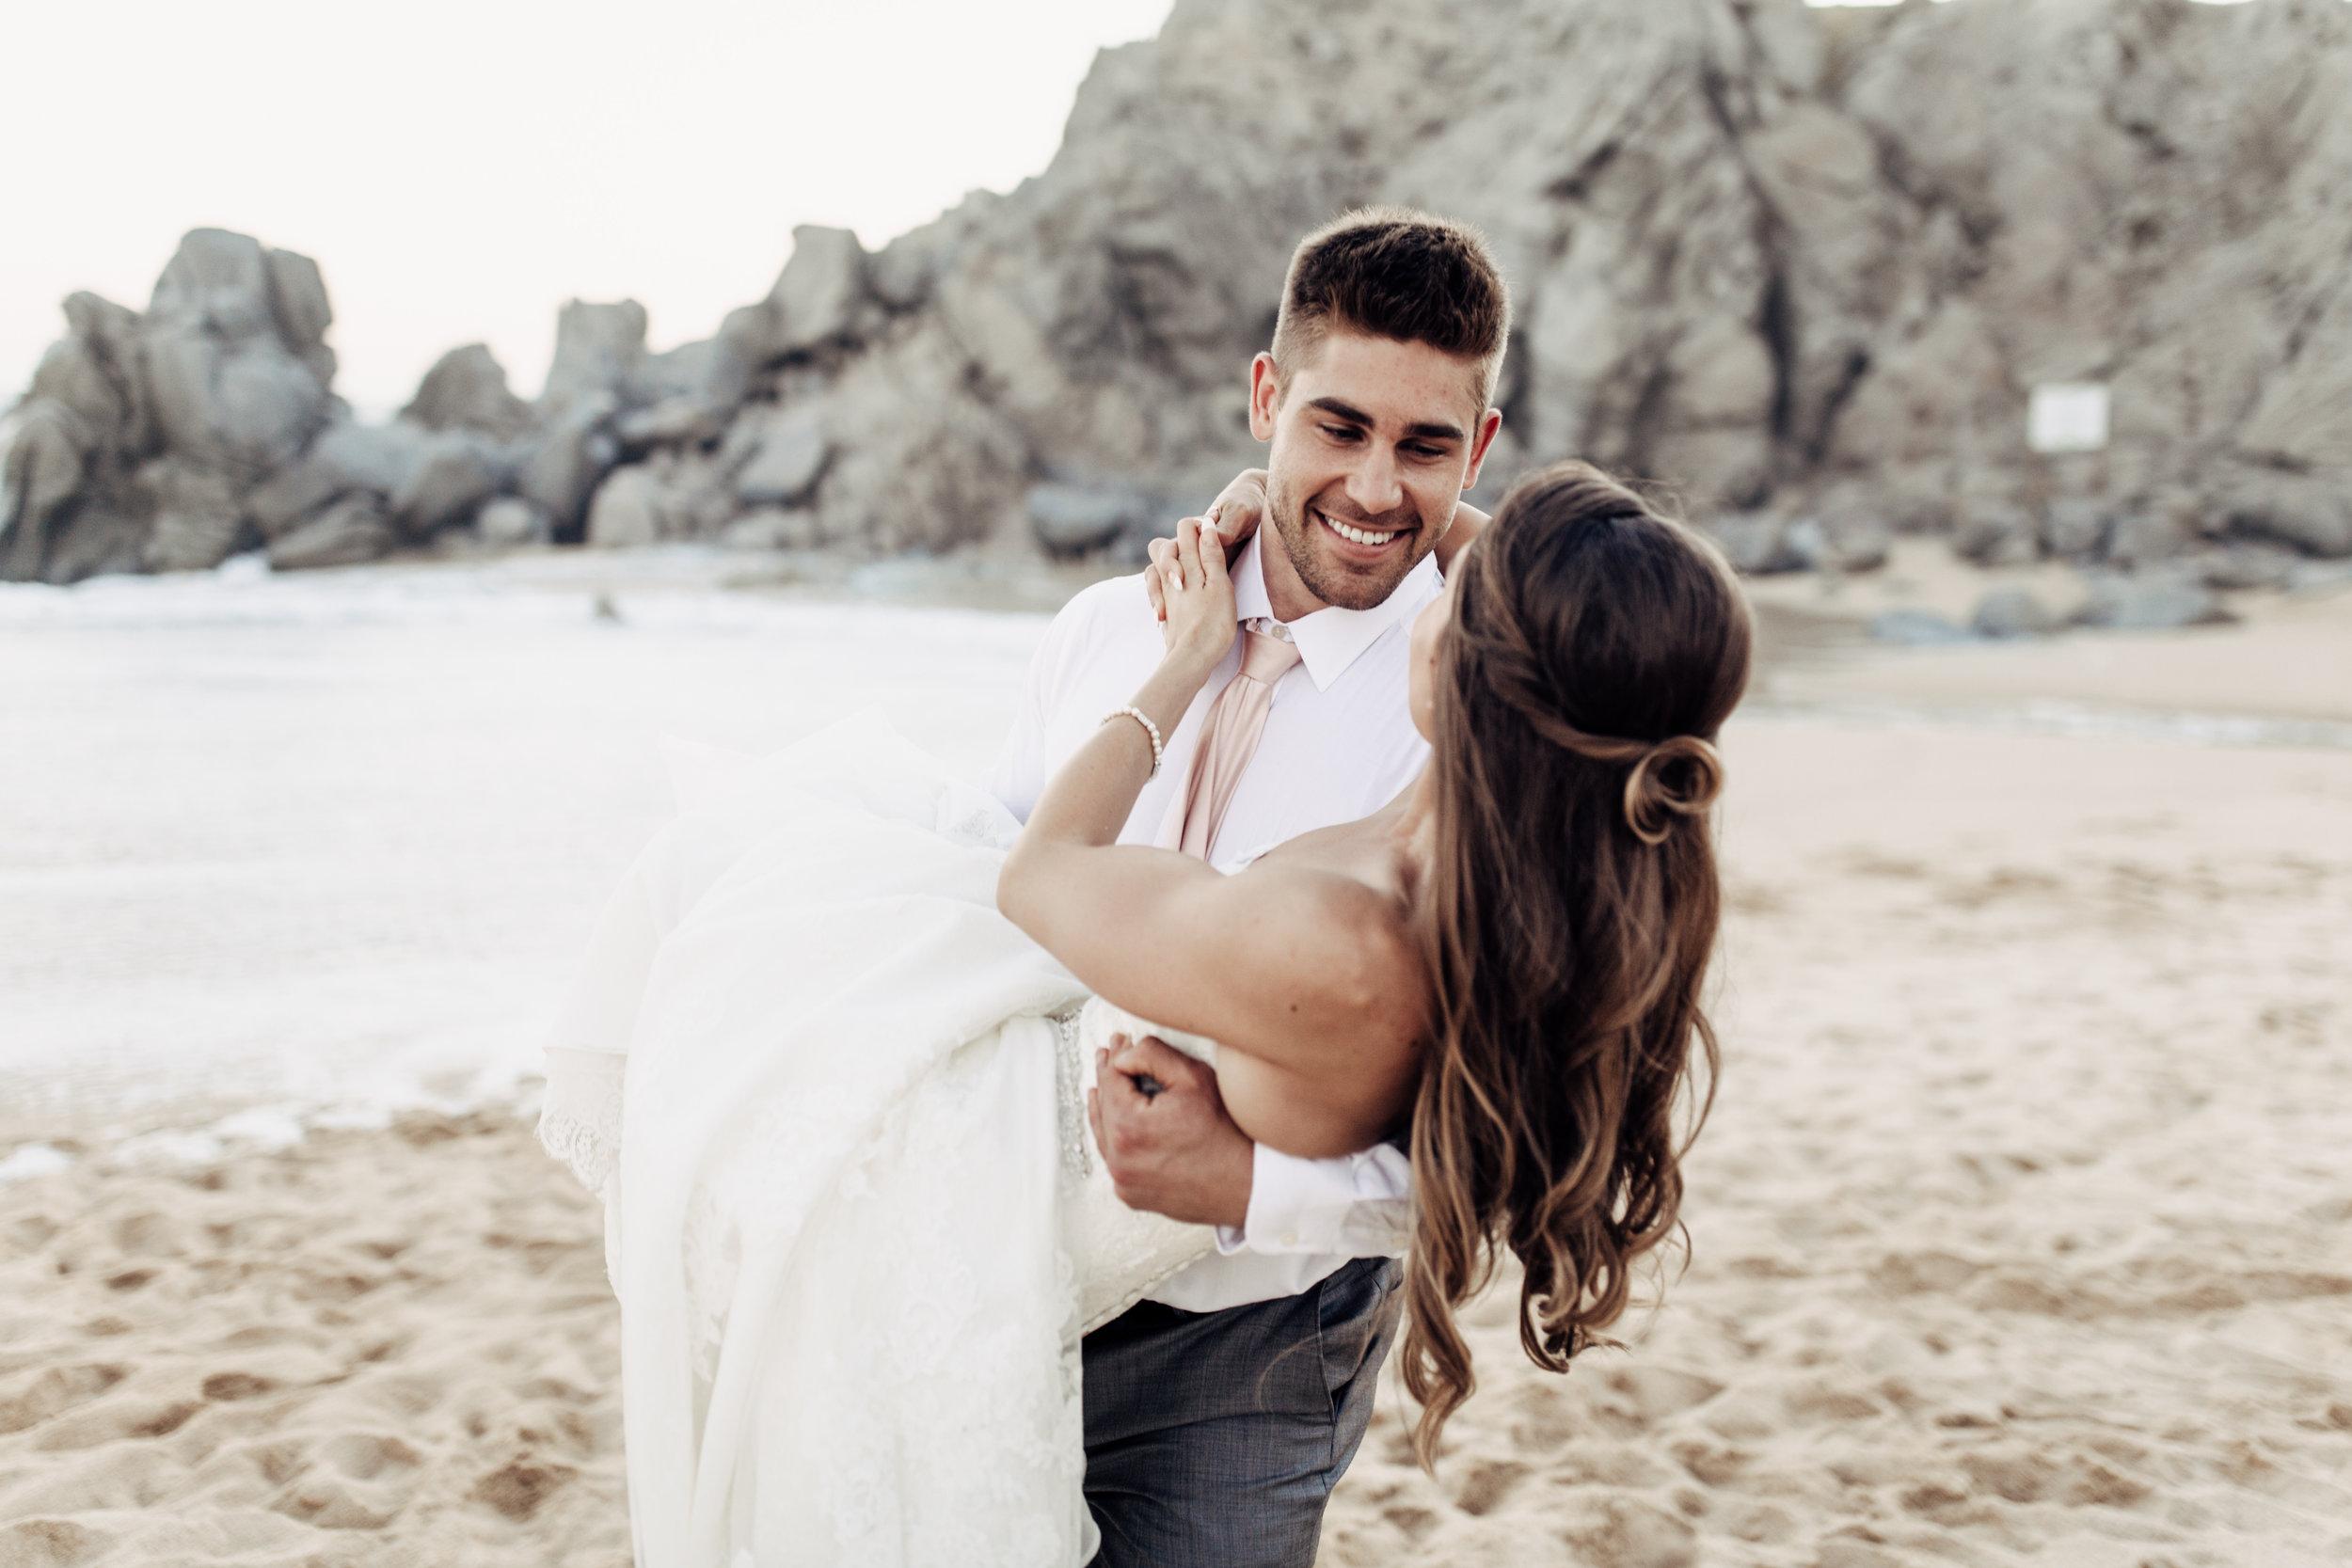 pueblo-bonito-sunset-beach-wedding-cabo-san-lucas624.jpg